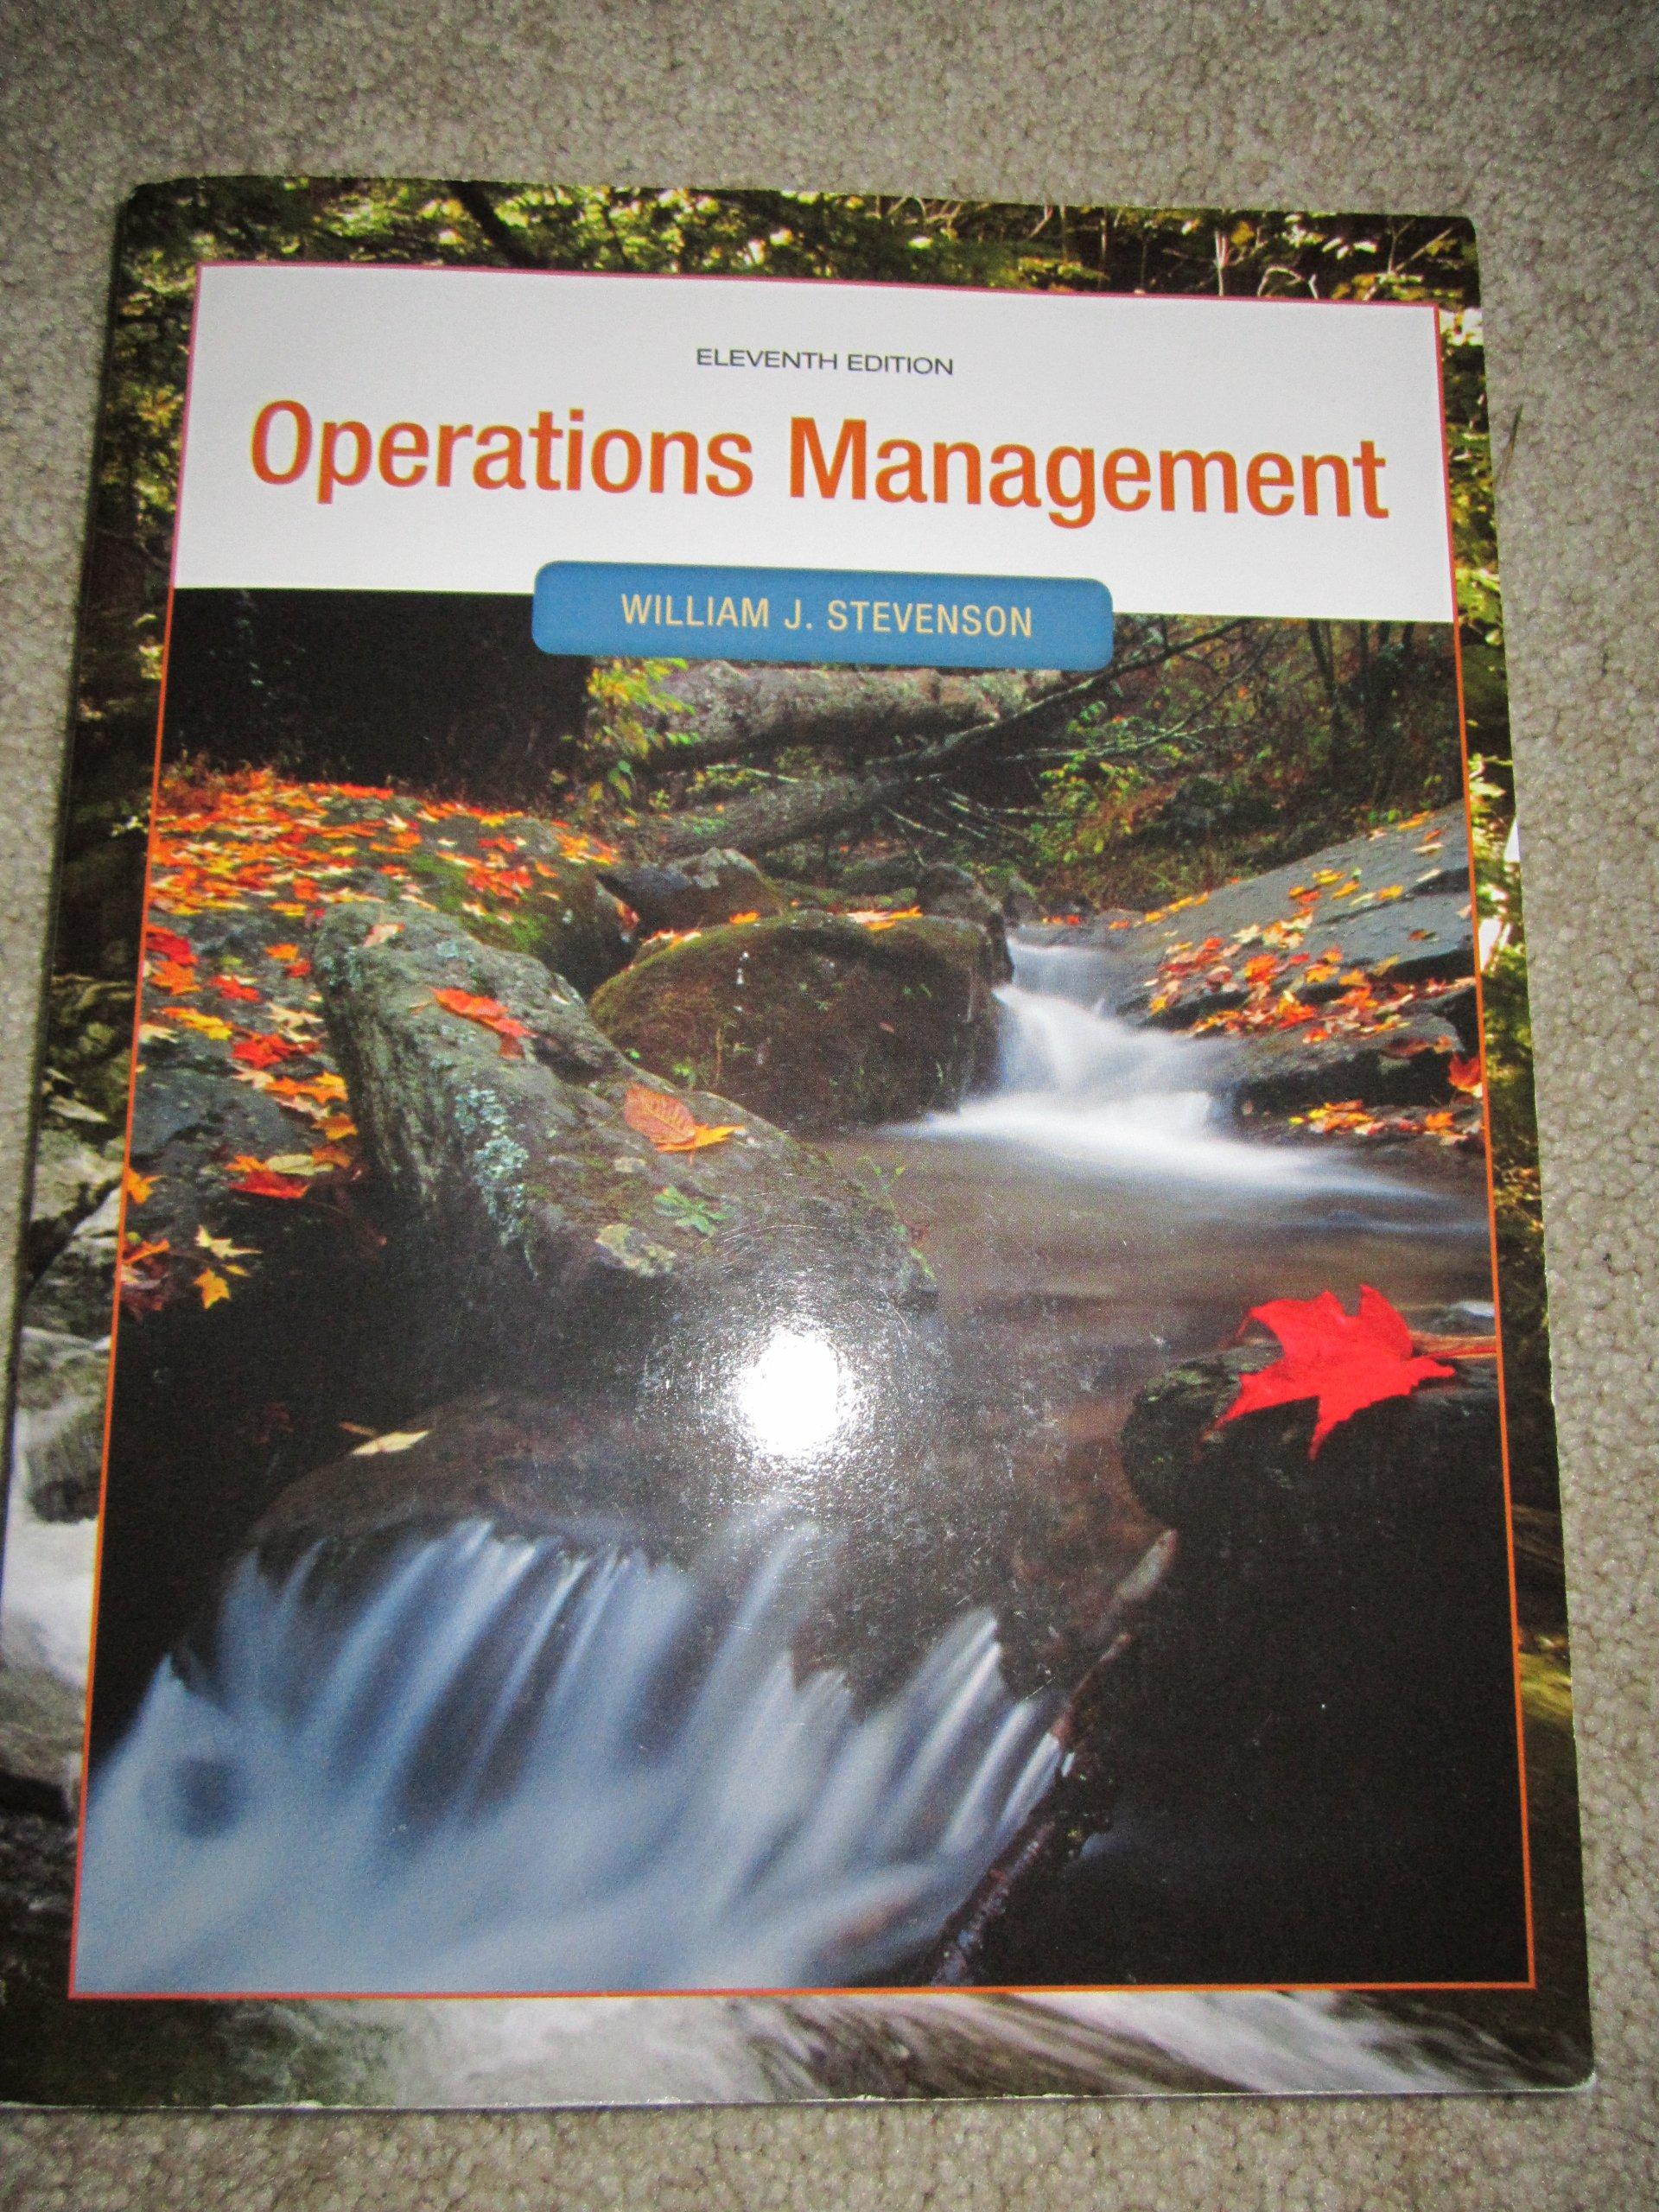 Operations Management: William J. Stevenson: 9780077549510: Amazon.com:  Books